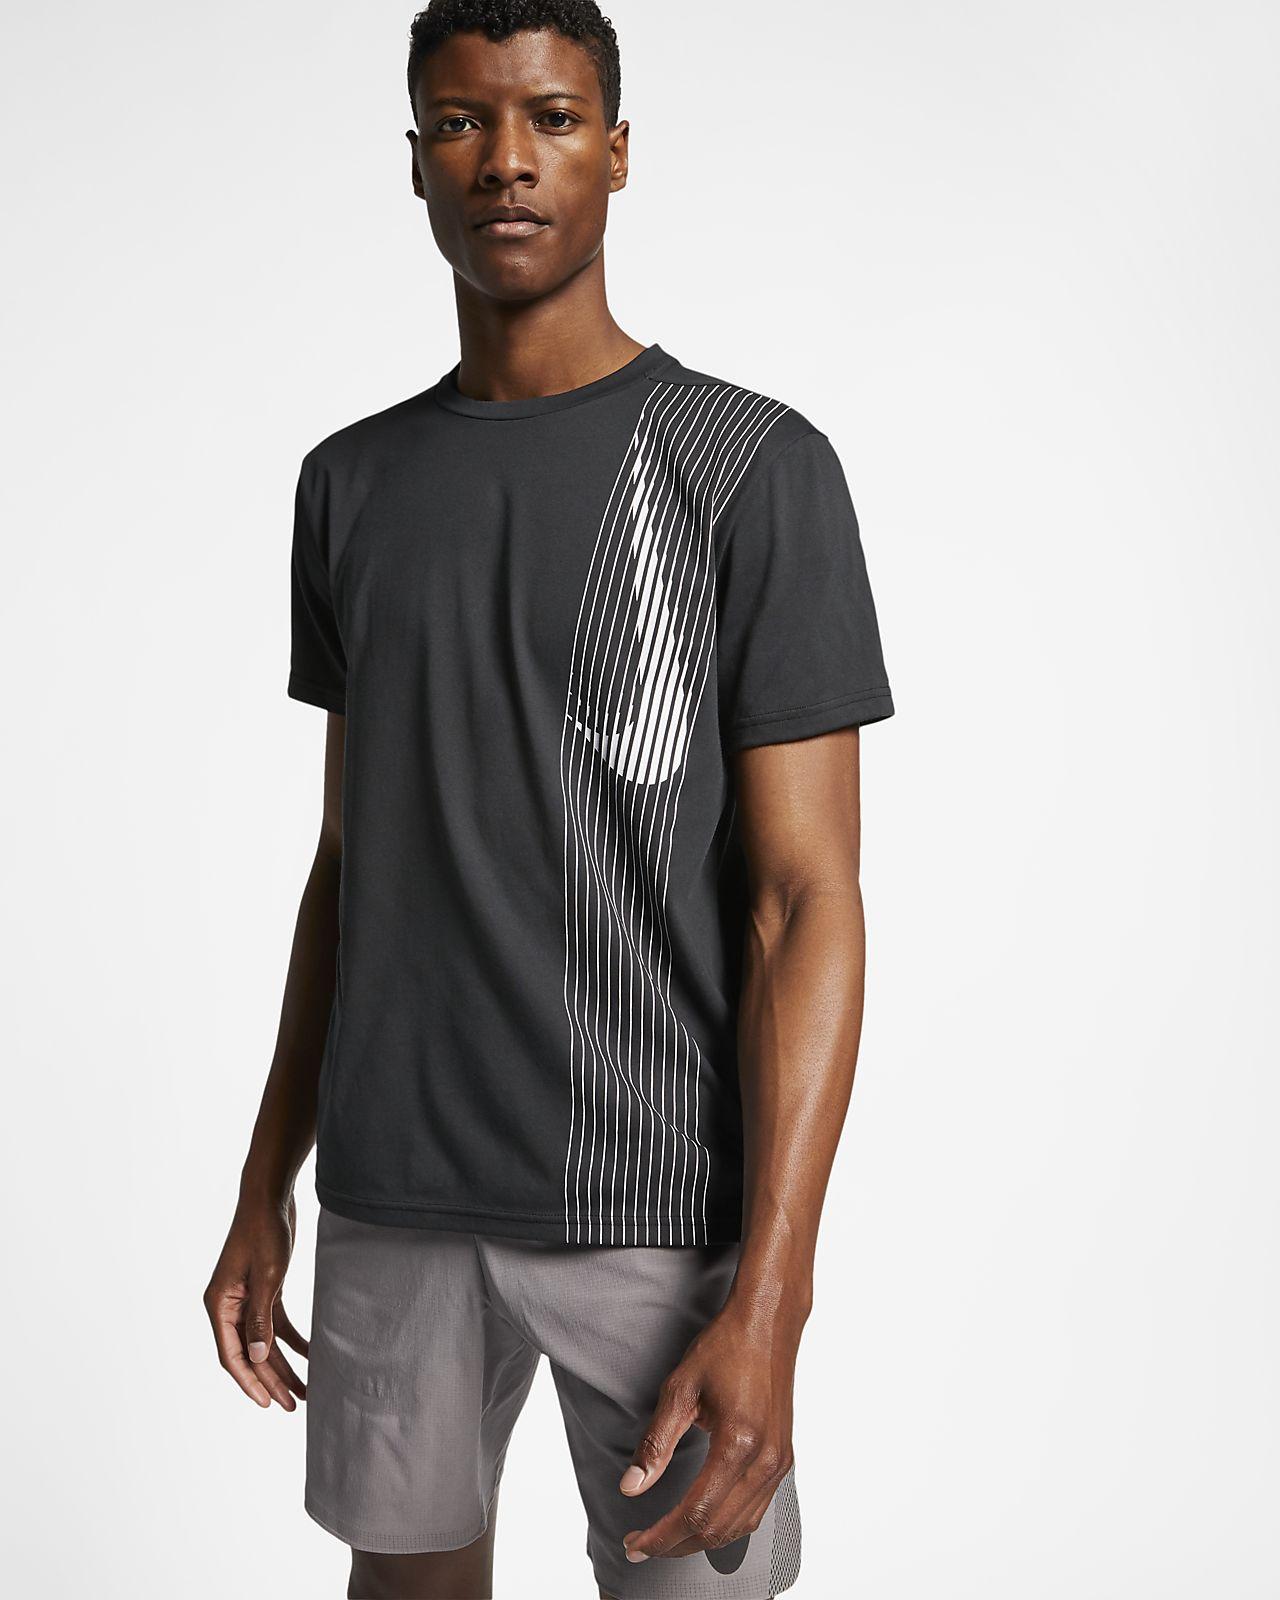 Nike Dri-FIT Camiseta de entrenamiento de manga corta - Hombre